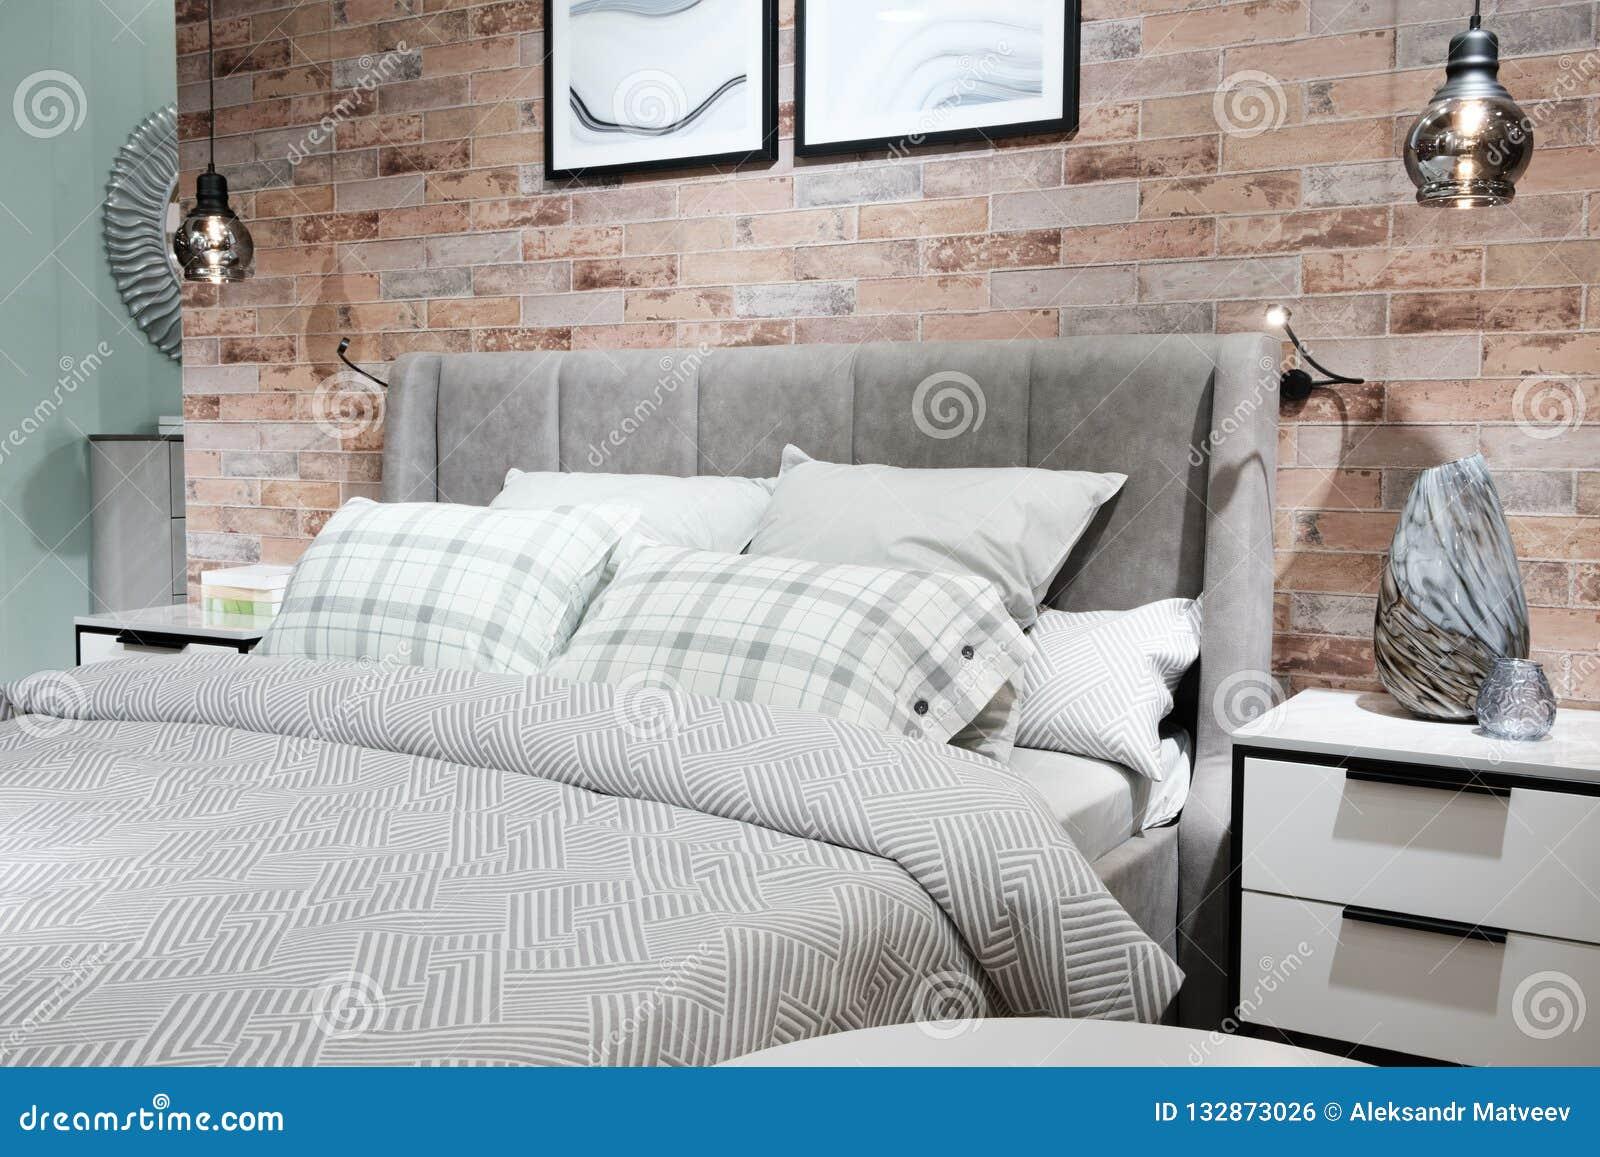 Creative Urban Interior Design Bedroom White Linen Stock Photo Image Of Empty Double 132873026